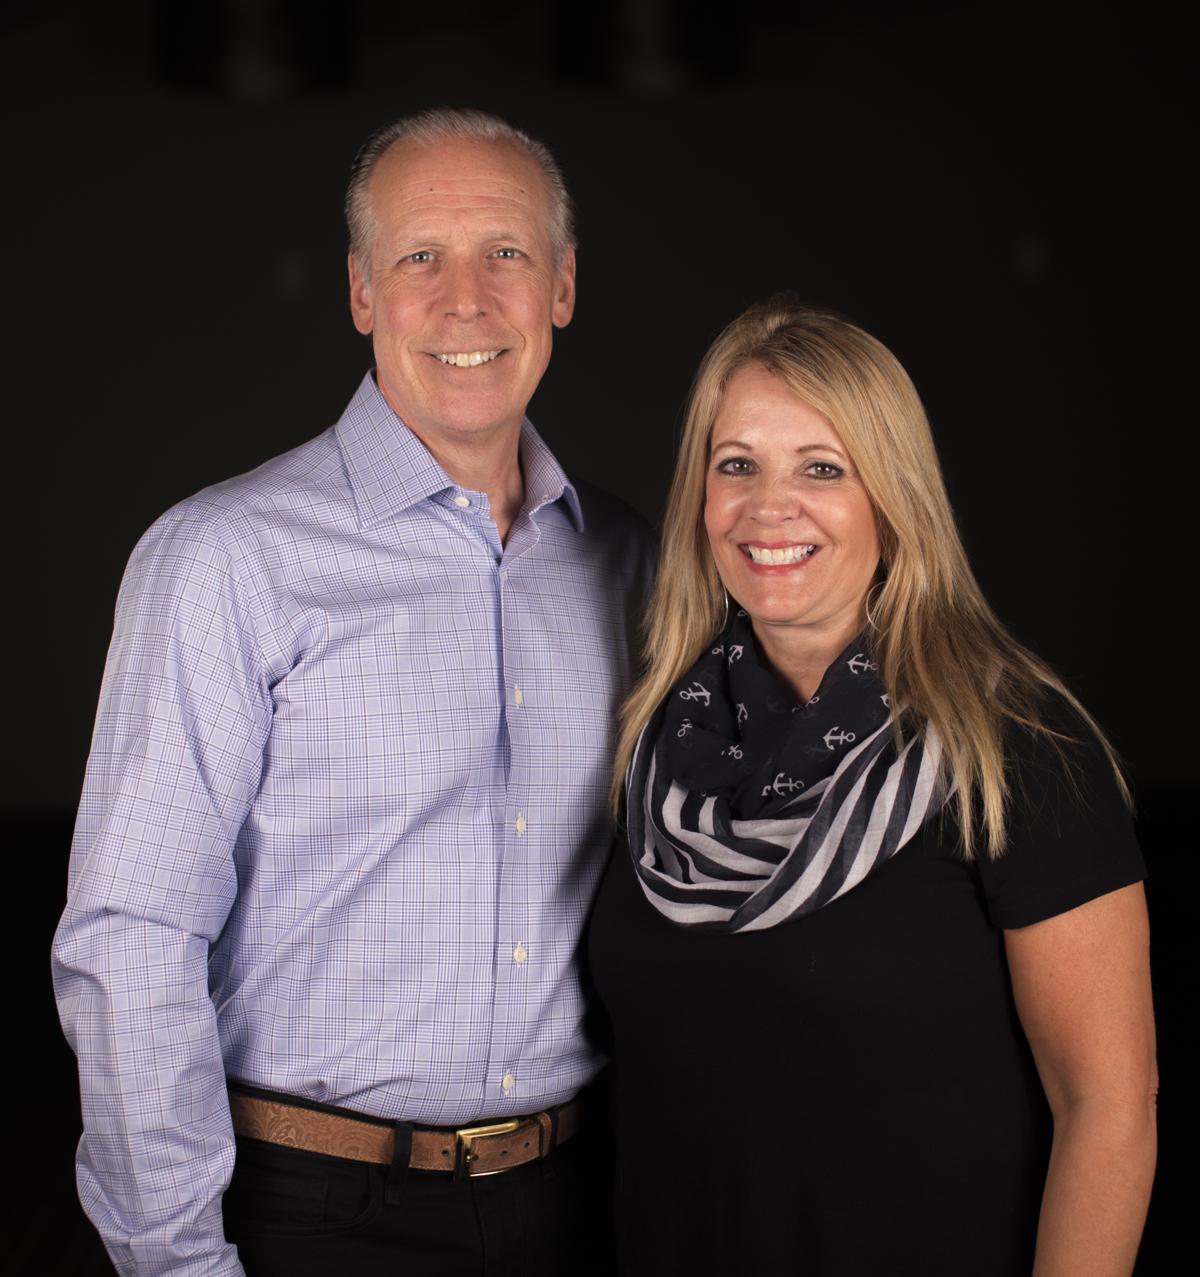 Pastors Stephen & Nancy Boyce  | Senior Pastors of New Life